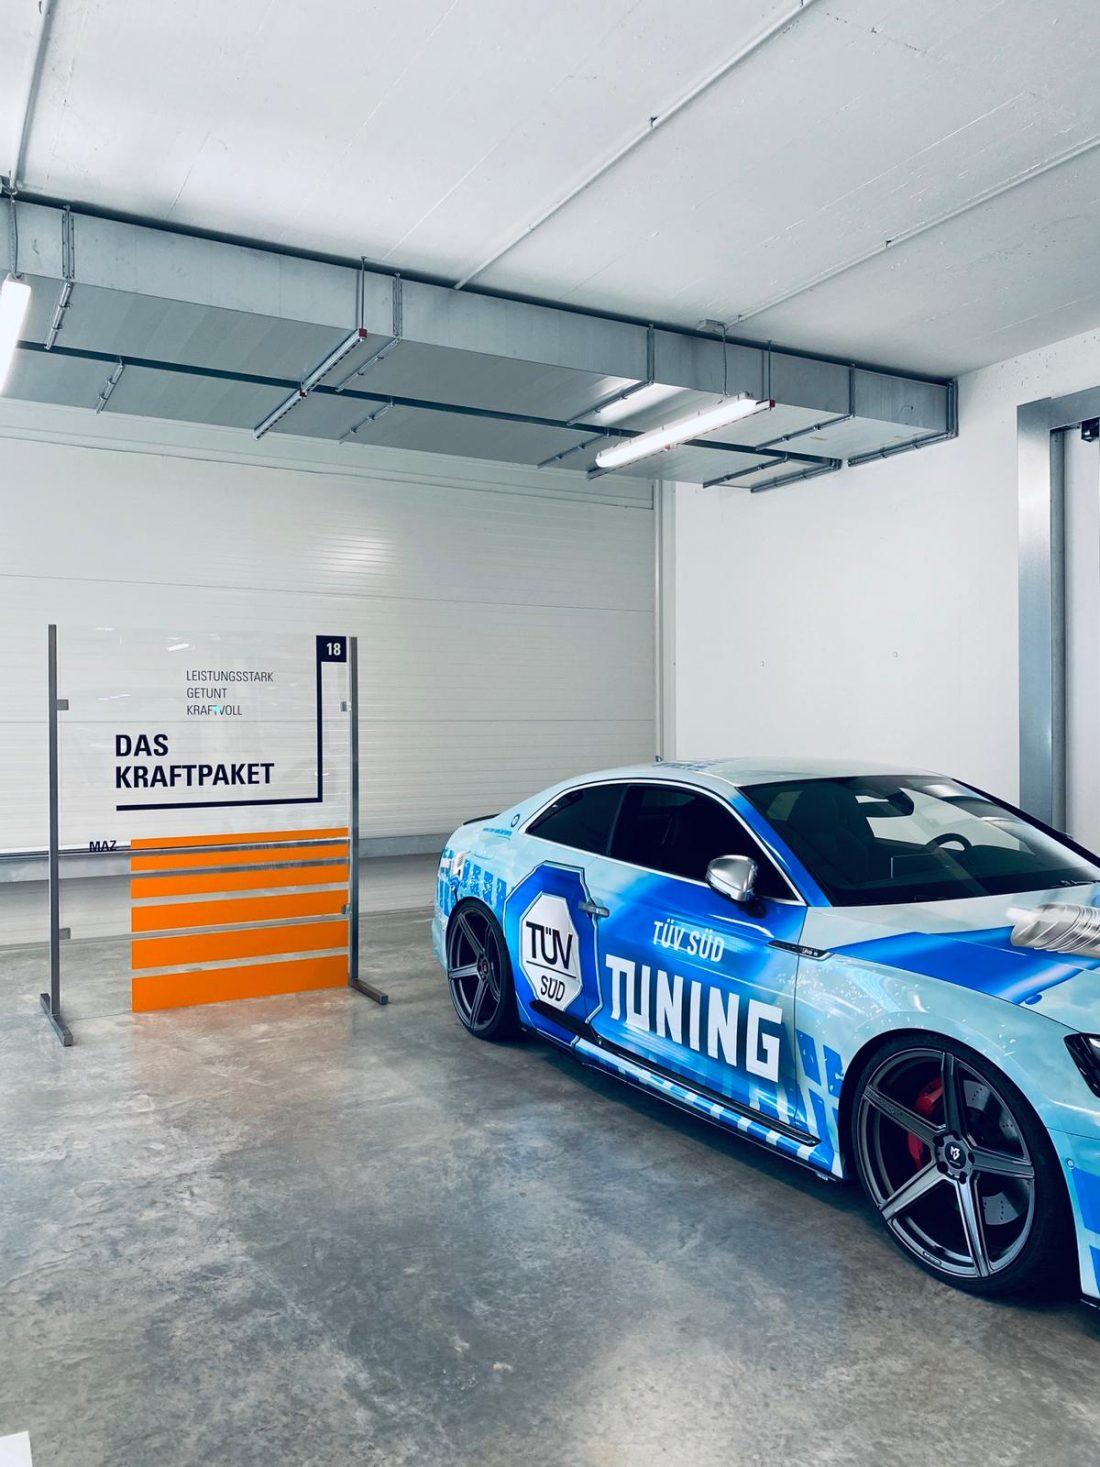 MAZ-Broschüre13 tuev sued Tuning auto |creo-media GmbH Hannover